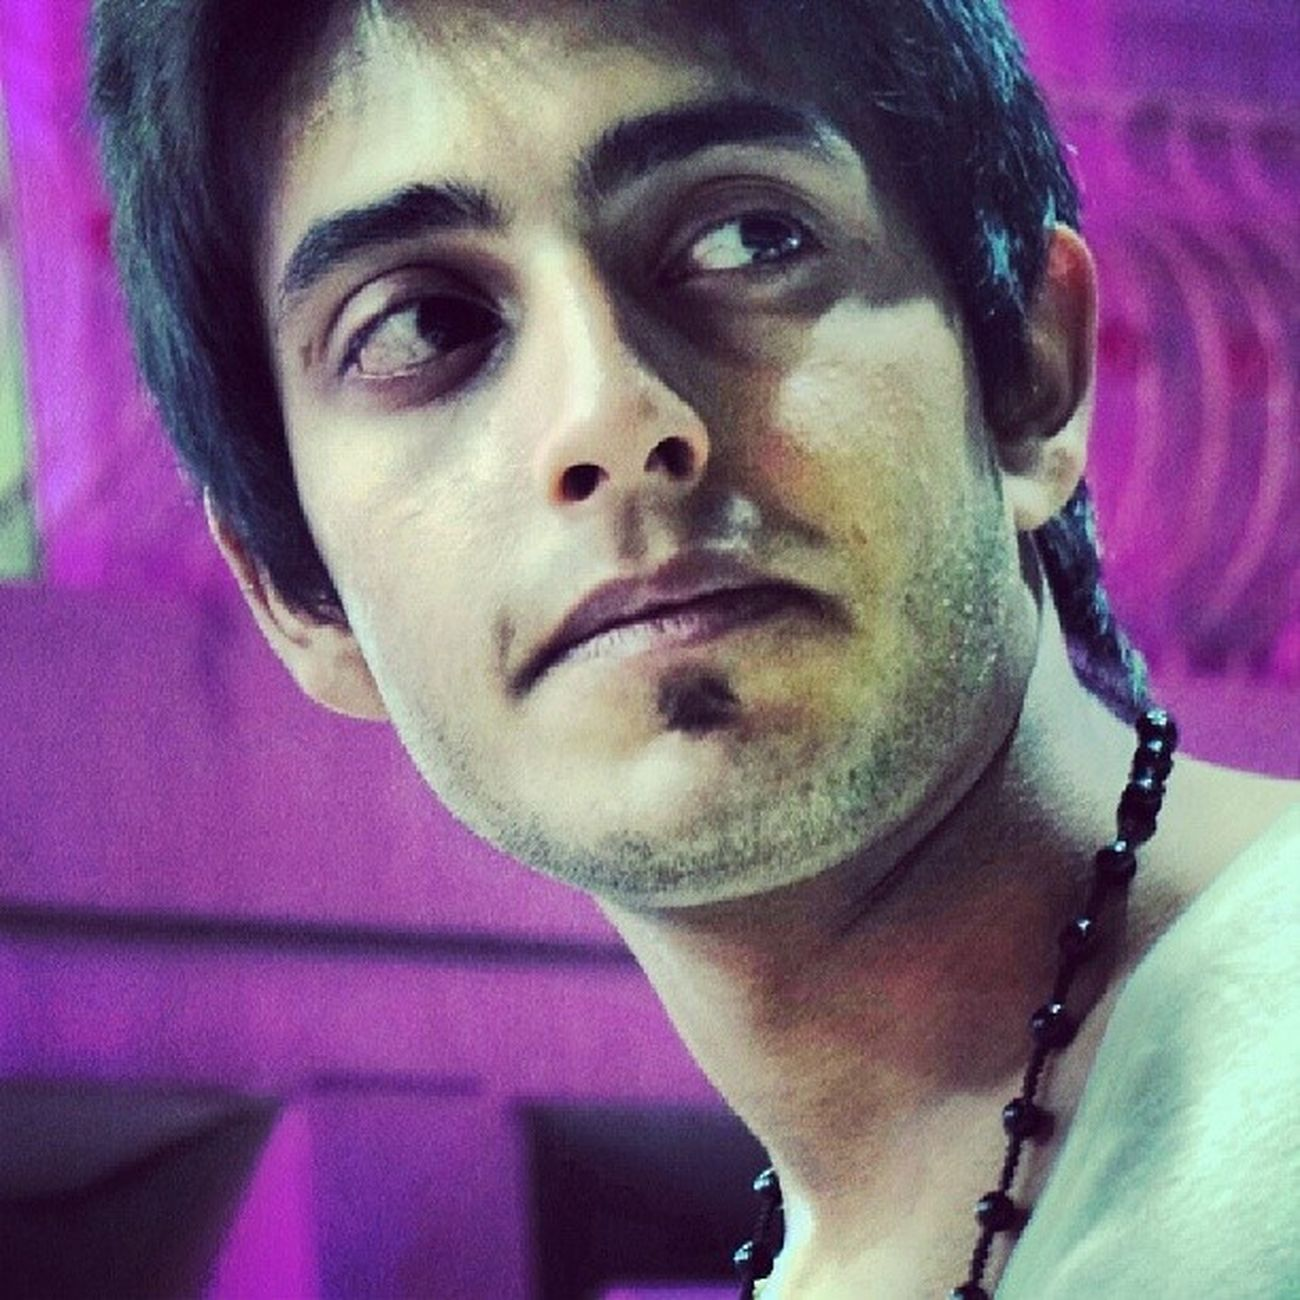 Me Thakkar Purplebackground Blackchain clickbysalahusman